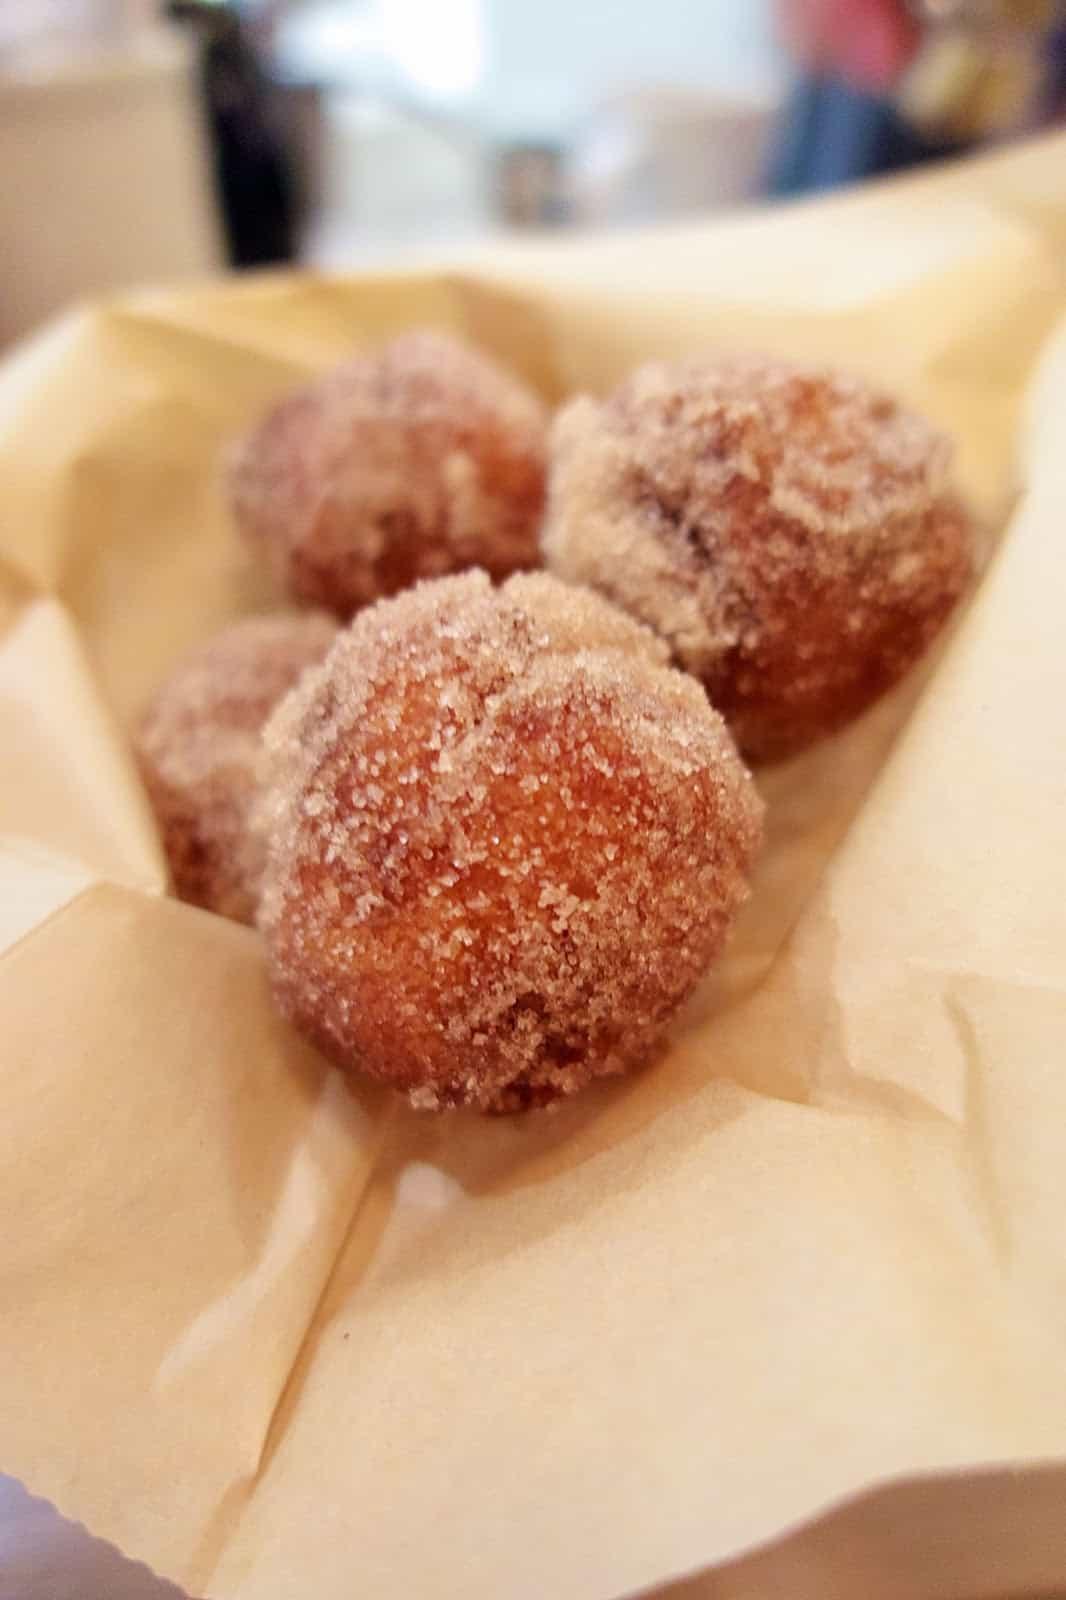 Pantry - Cinnamon Sugar Doughnut Bites